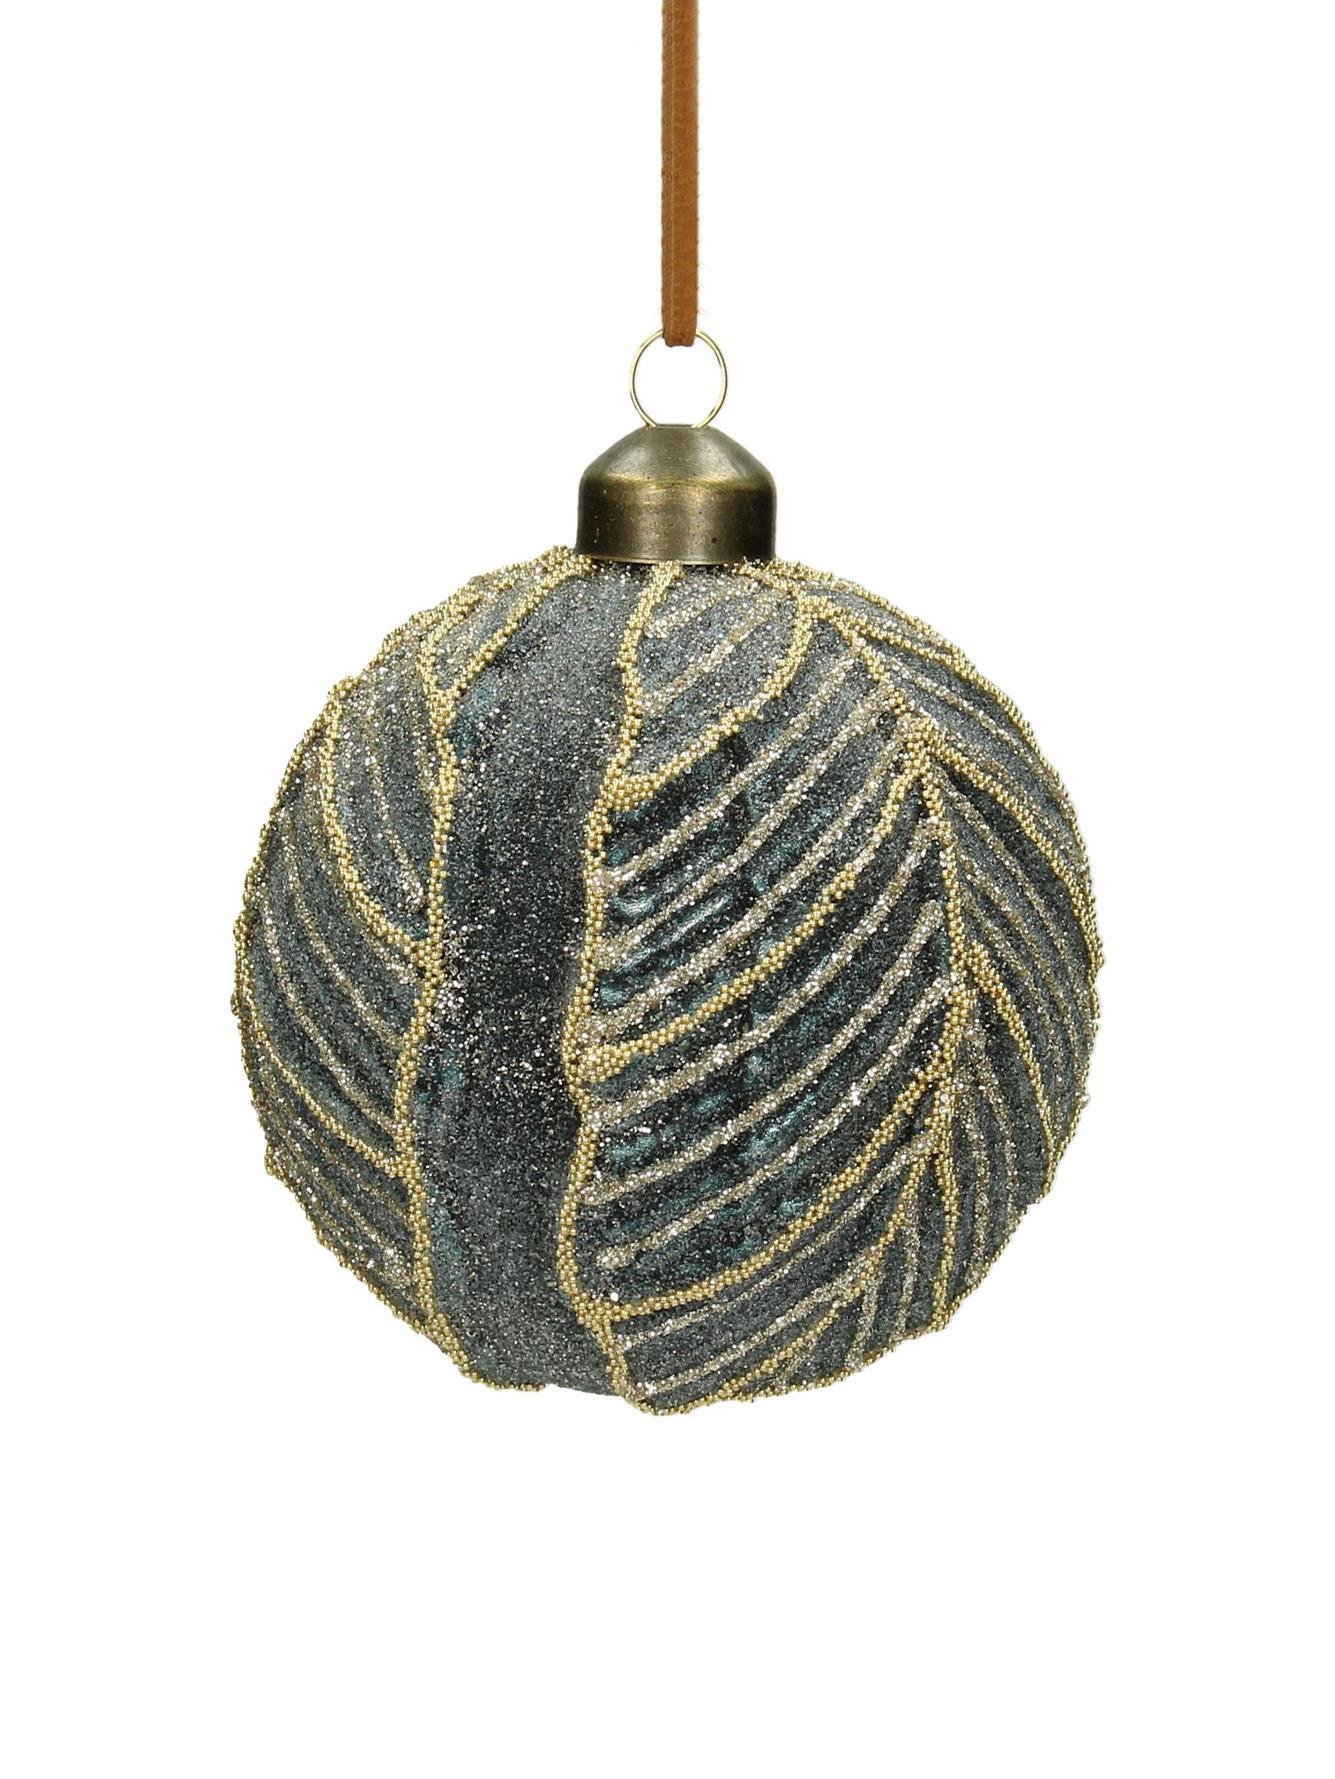 Weihnachtskugeln Leaf Ø8cm, 2Stück, Glas, Polyester, Kunststoff, Graublau, Ø 8 cm